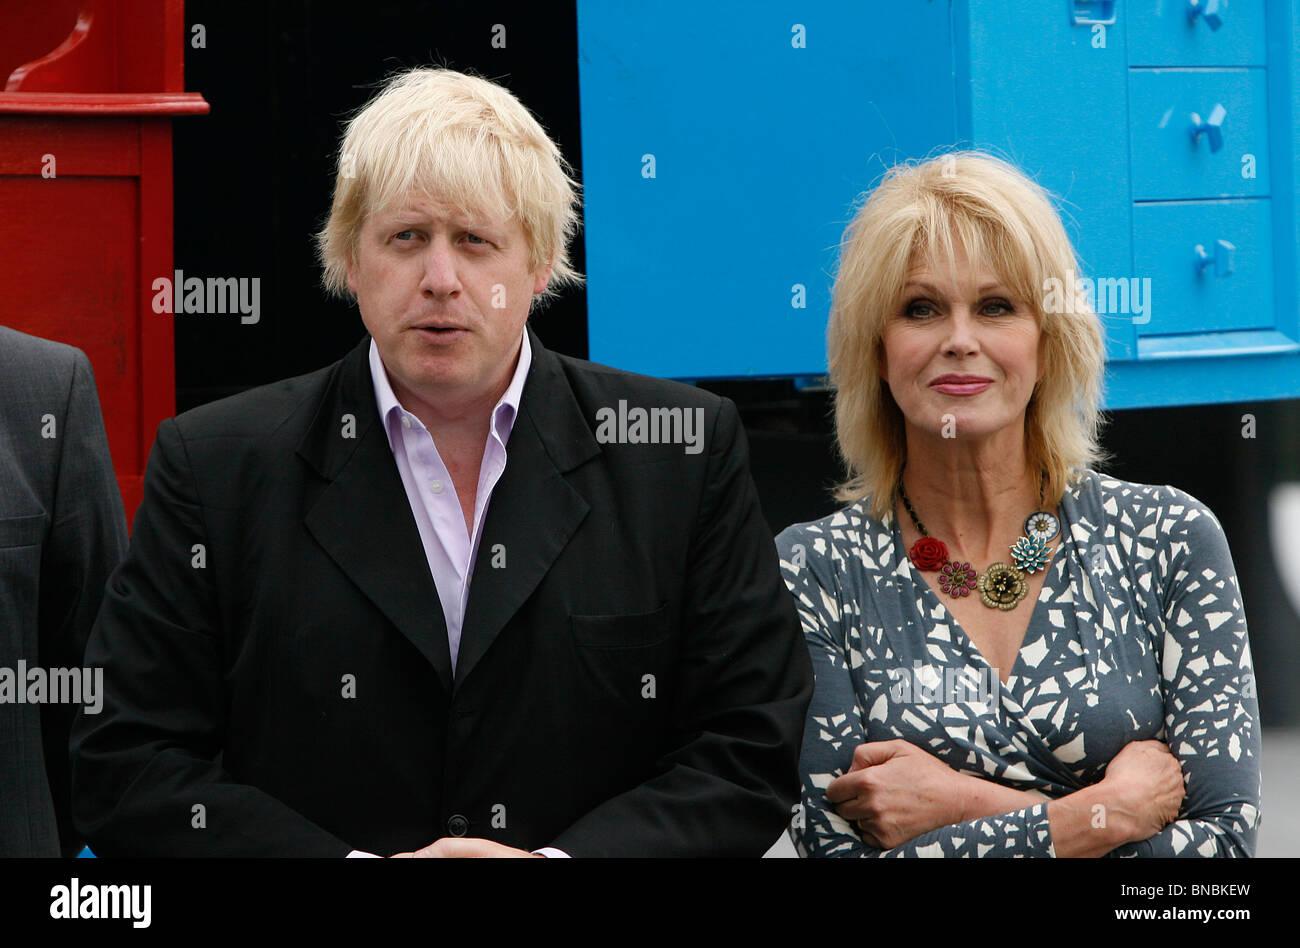 Mayor of London Boris Johnson with actress Joanna Lumley OBE outside City Hall - Stock Image